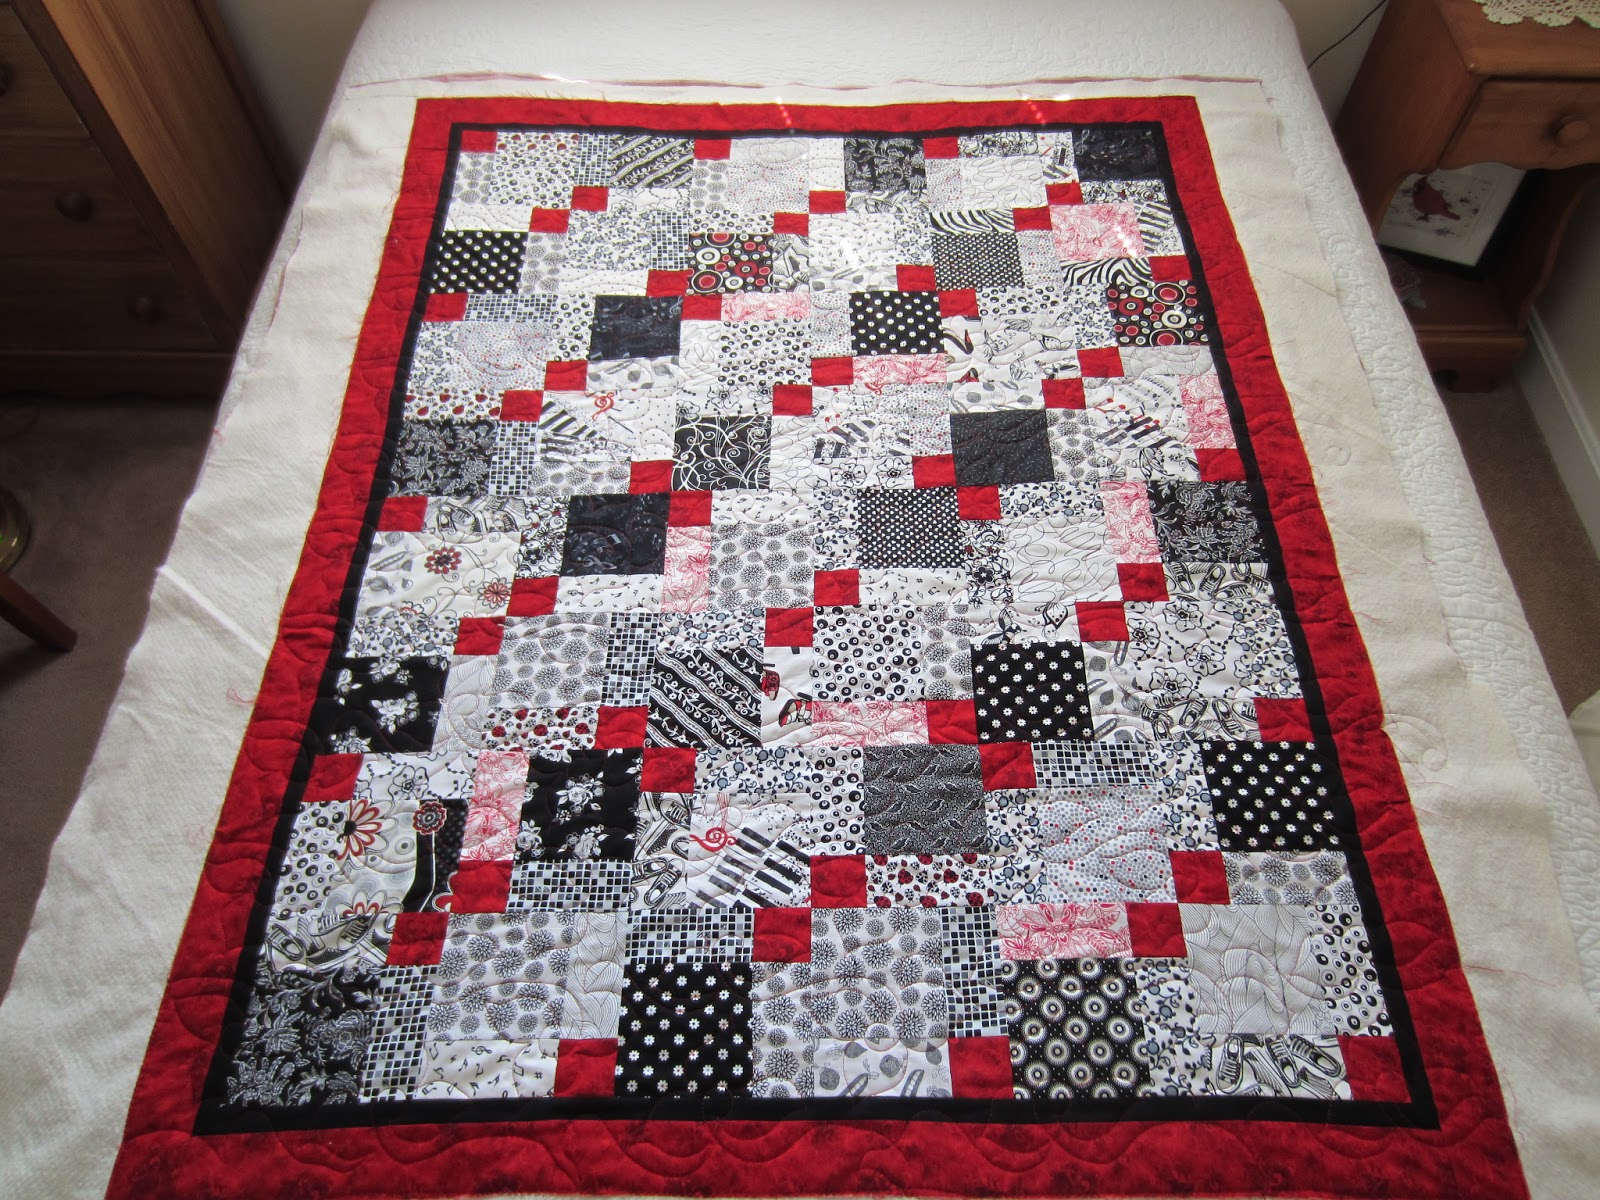 Deborah S Quilting Mary S Lap Quilts